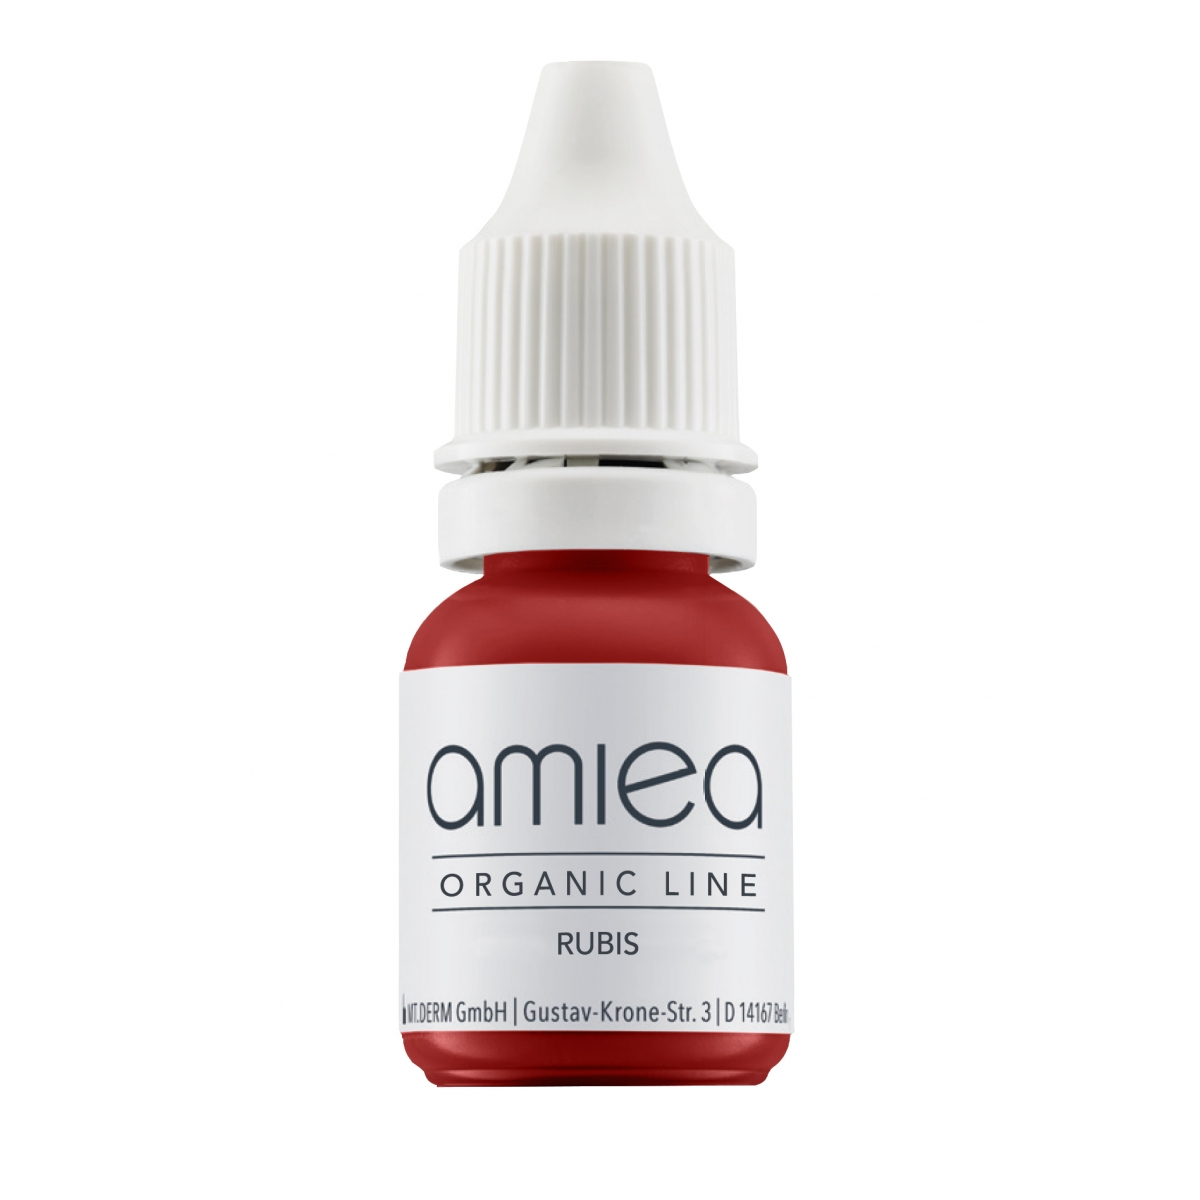 Organicline (10 ml) - PIGMENTS AMIEA ORGANICLINE RUBIS, Flacon 10 ml